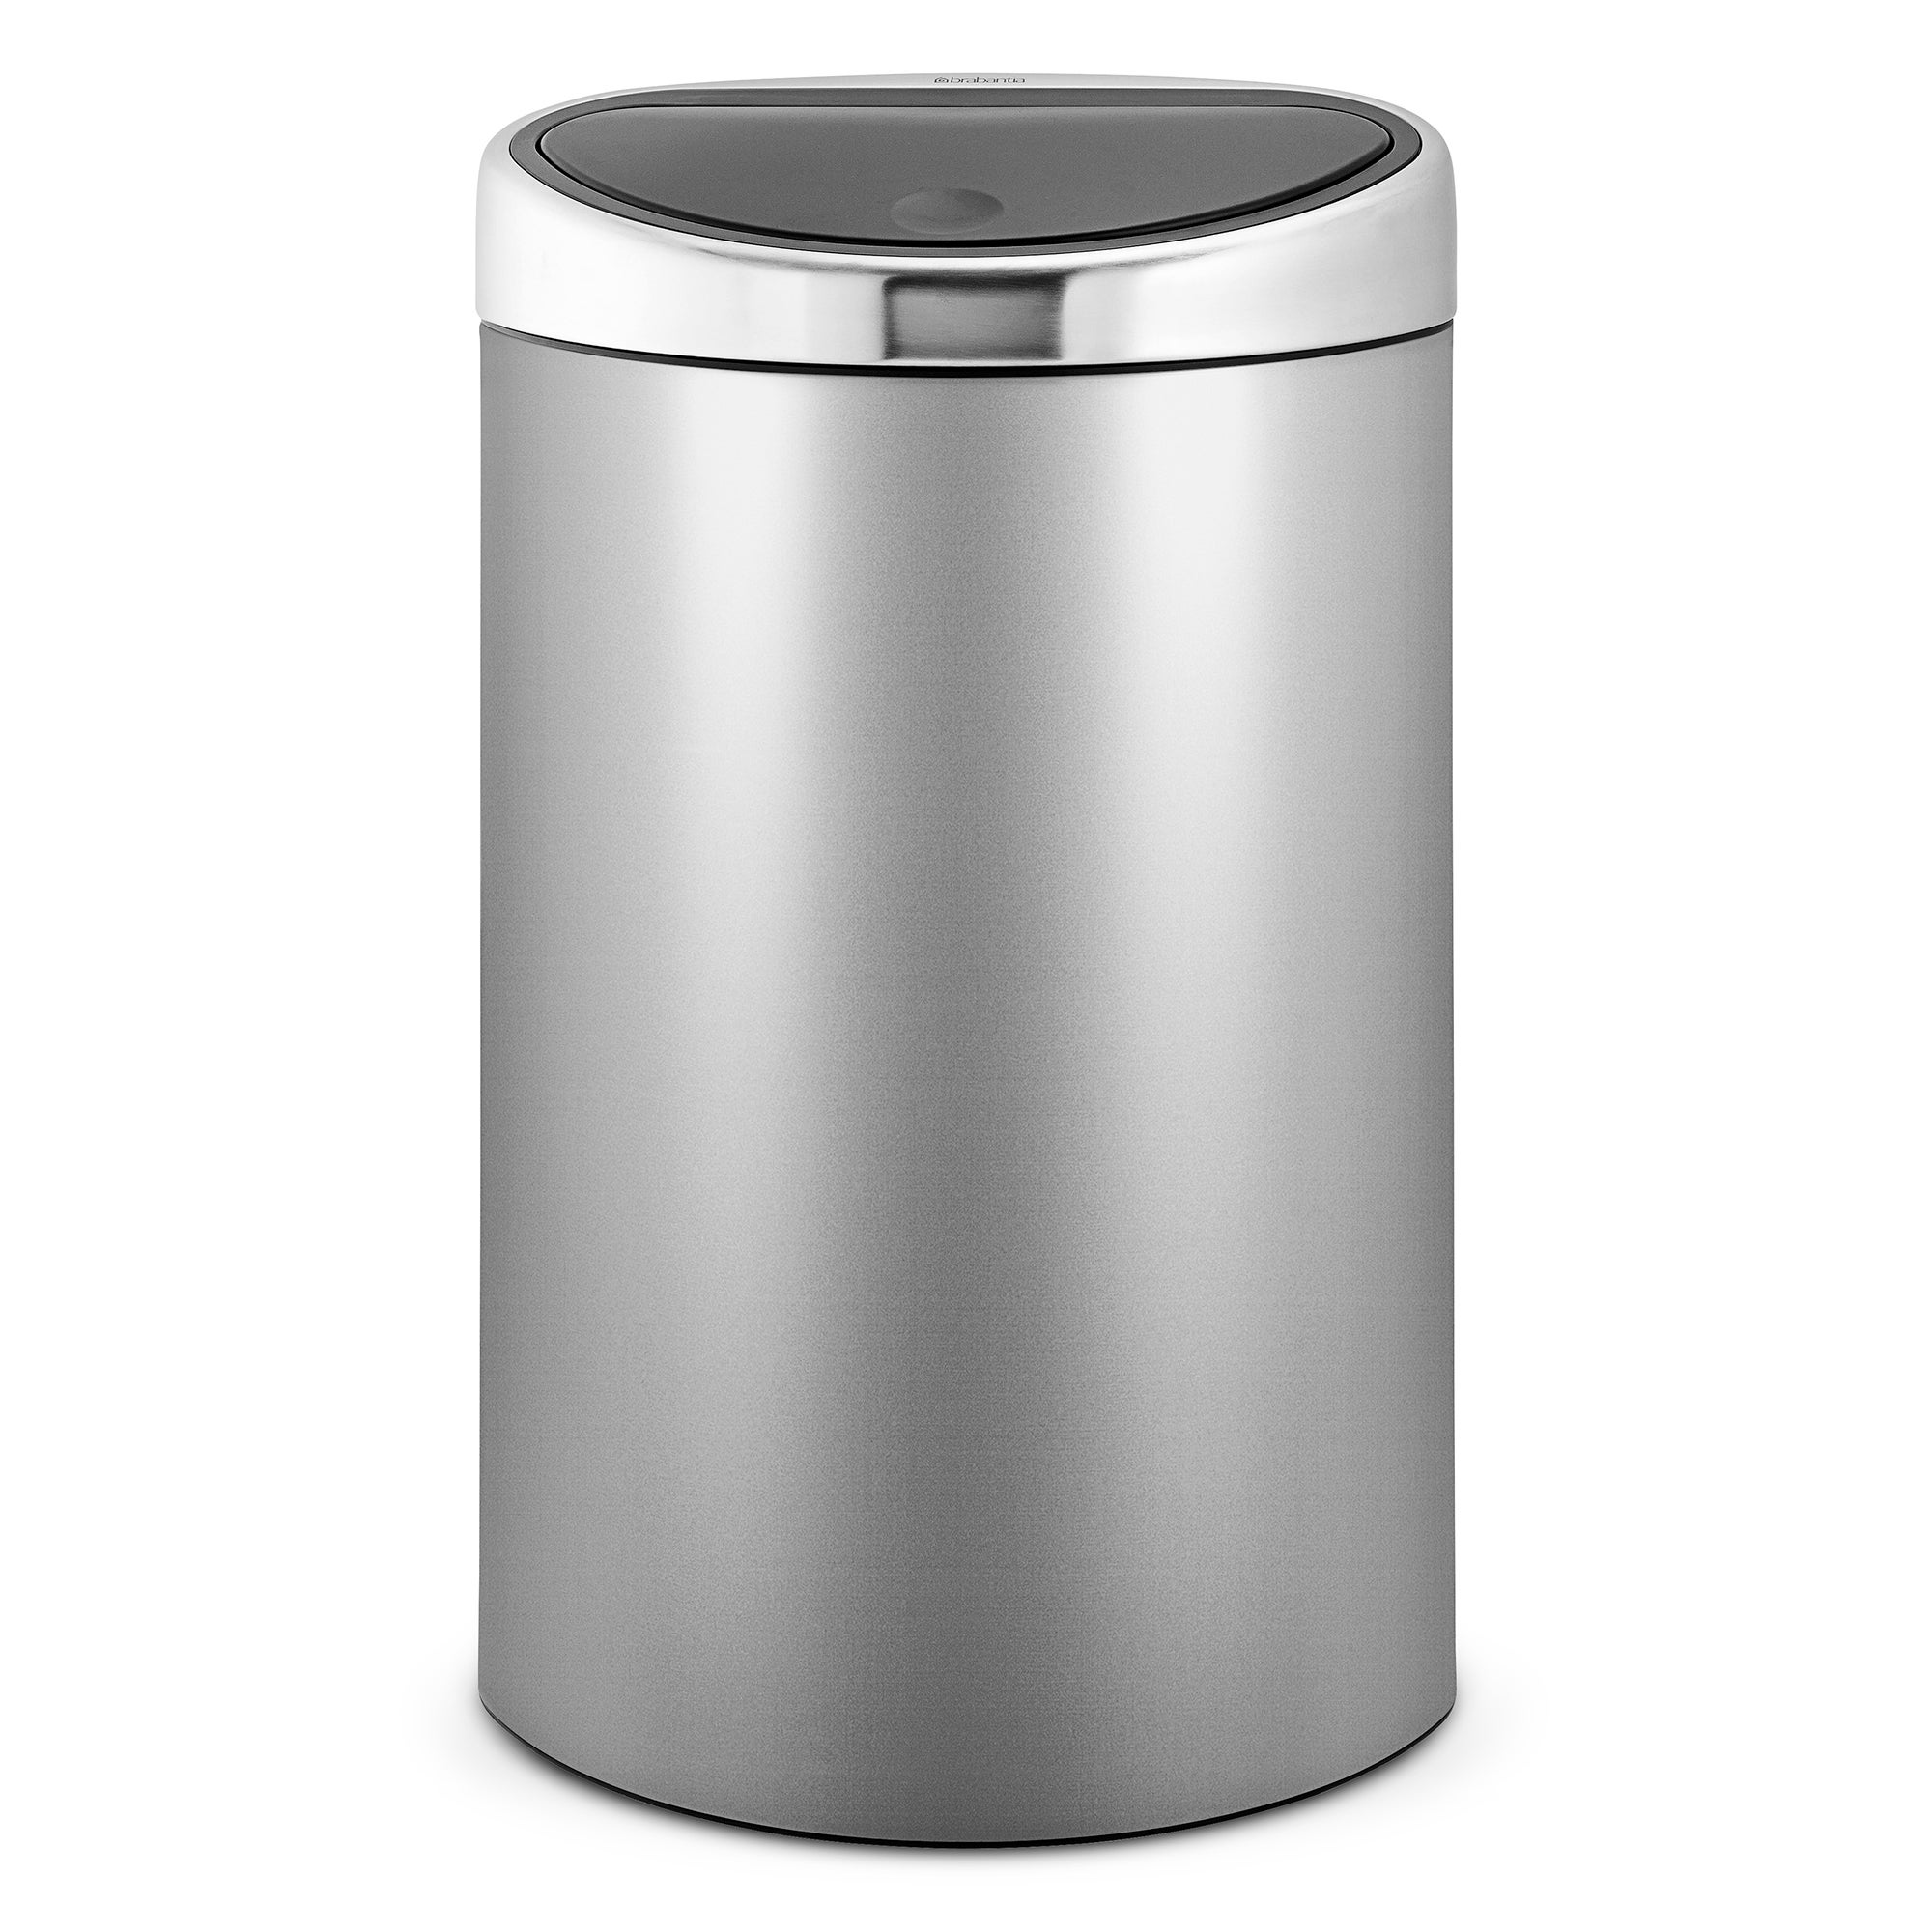 Brabantia Metallic Grey 40 Litre Touch Bin